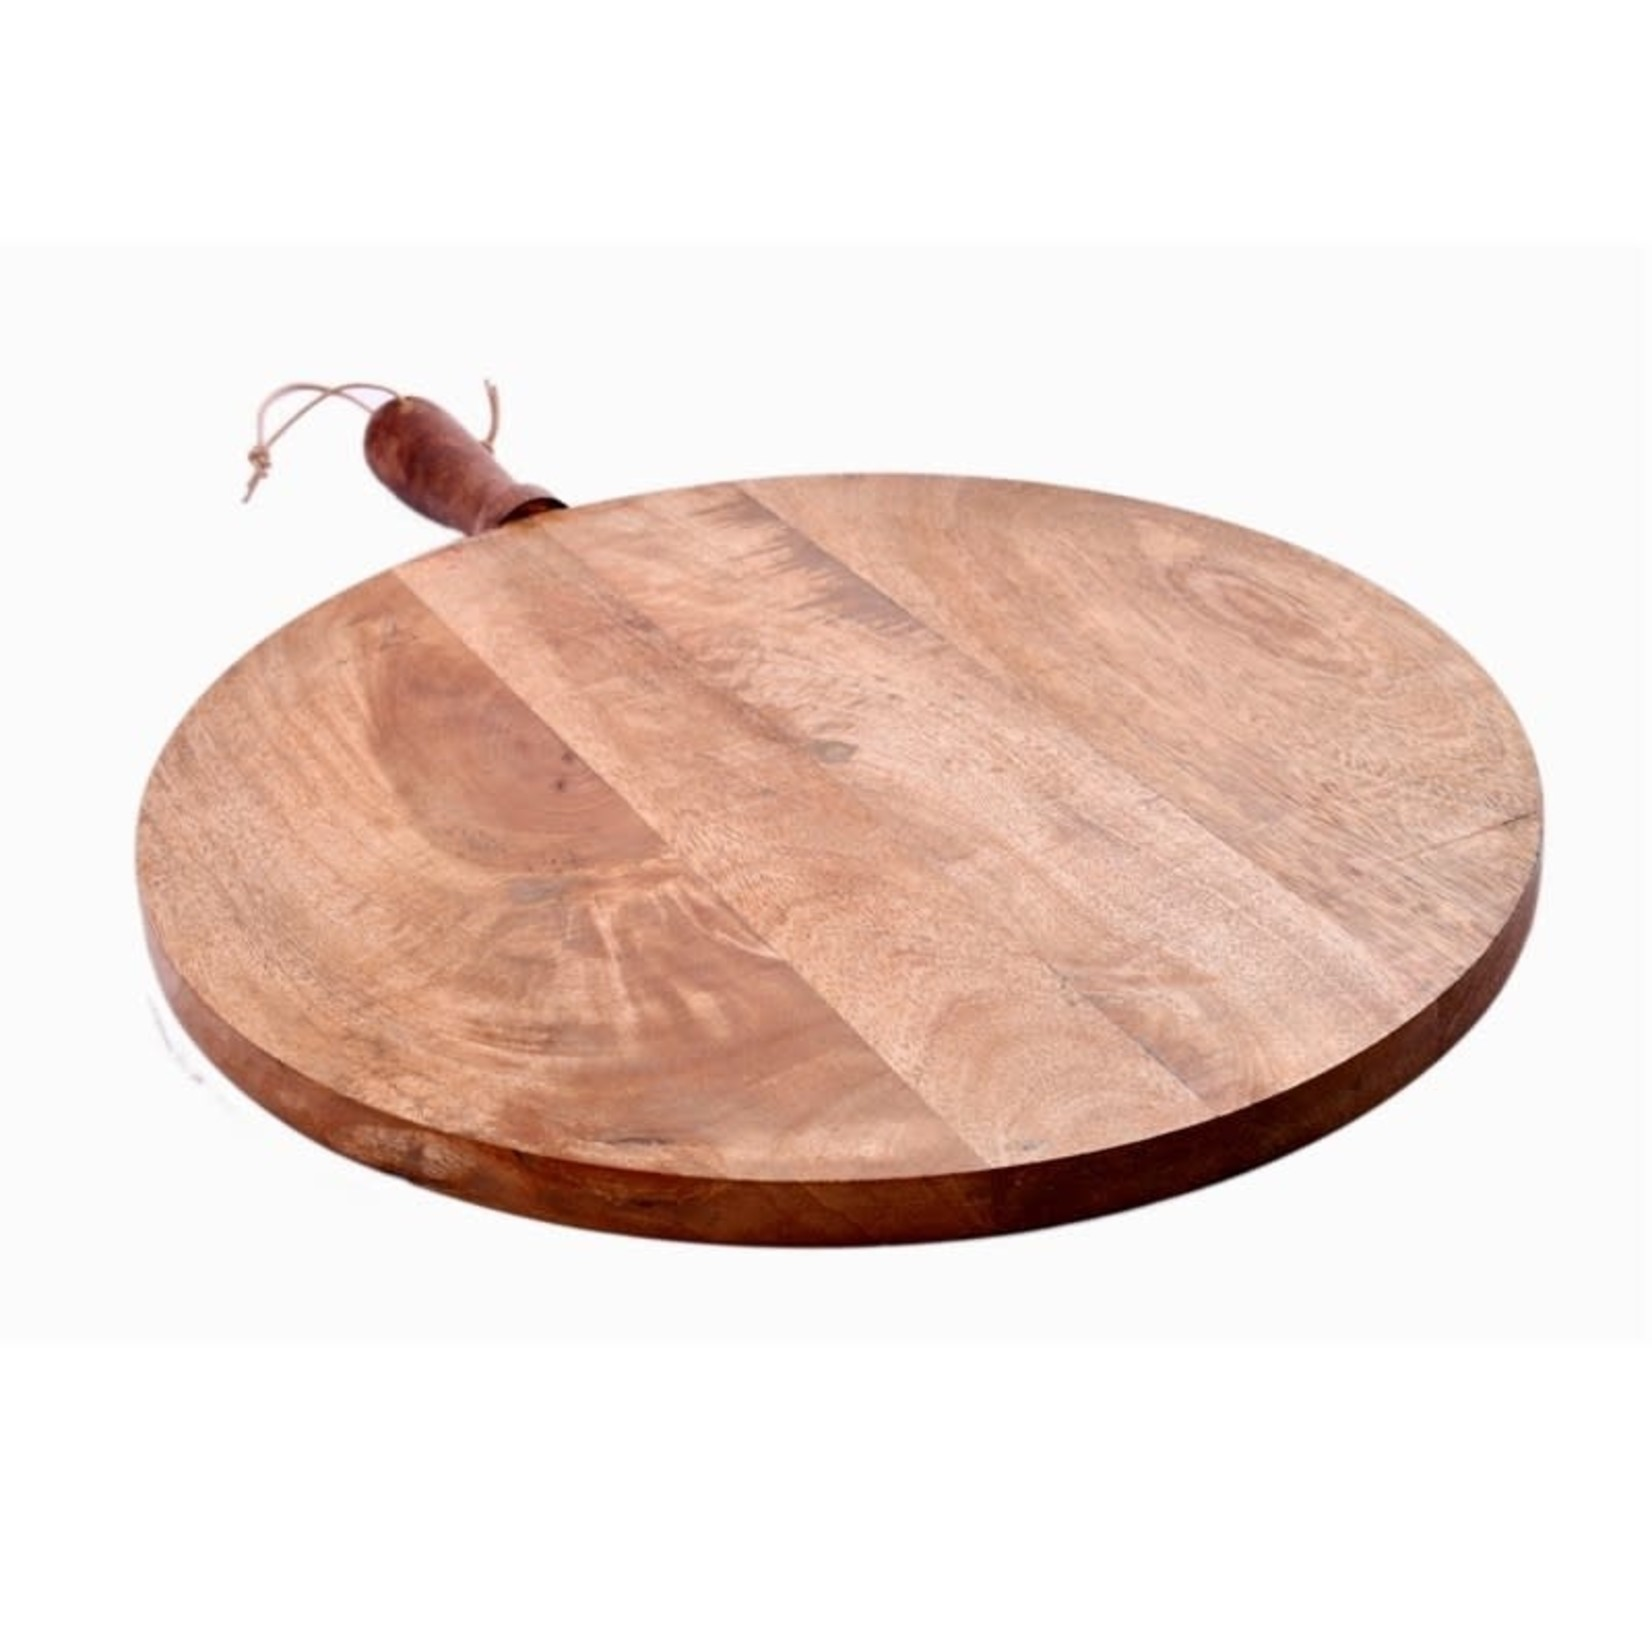 Medium Round Handled Serving Board